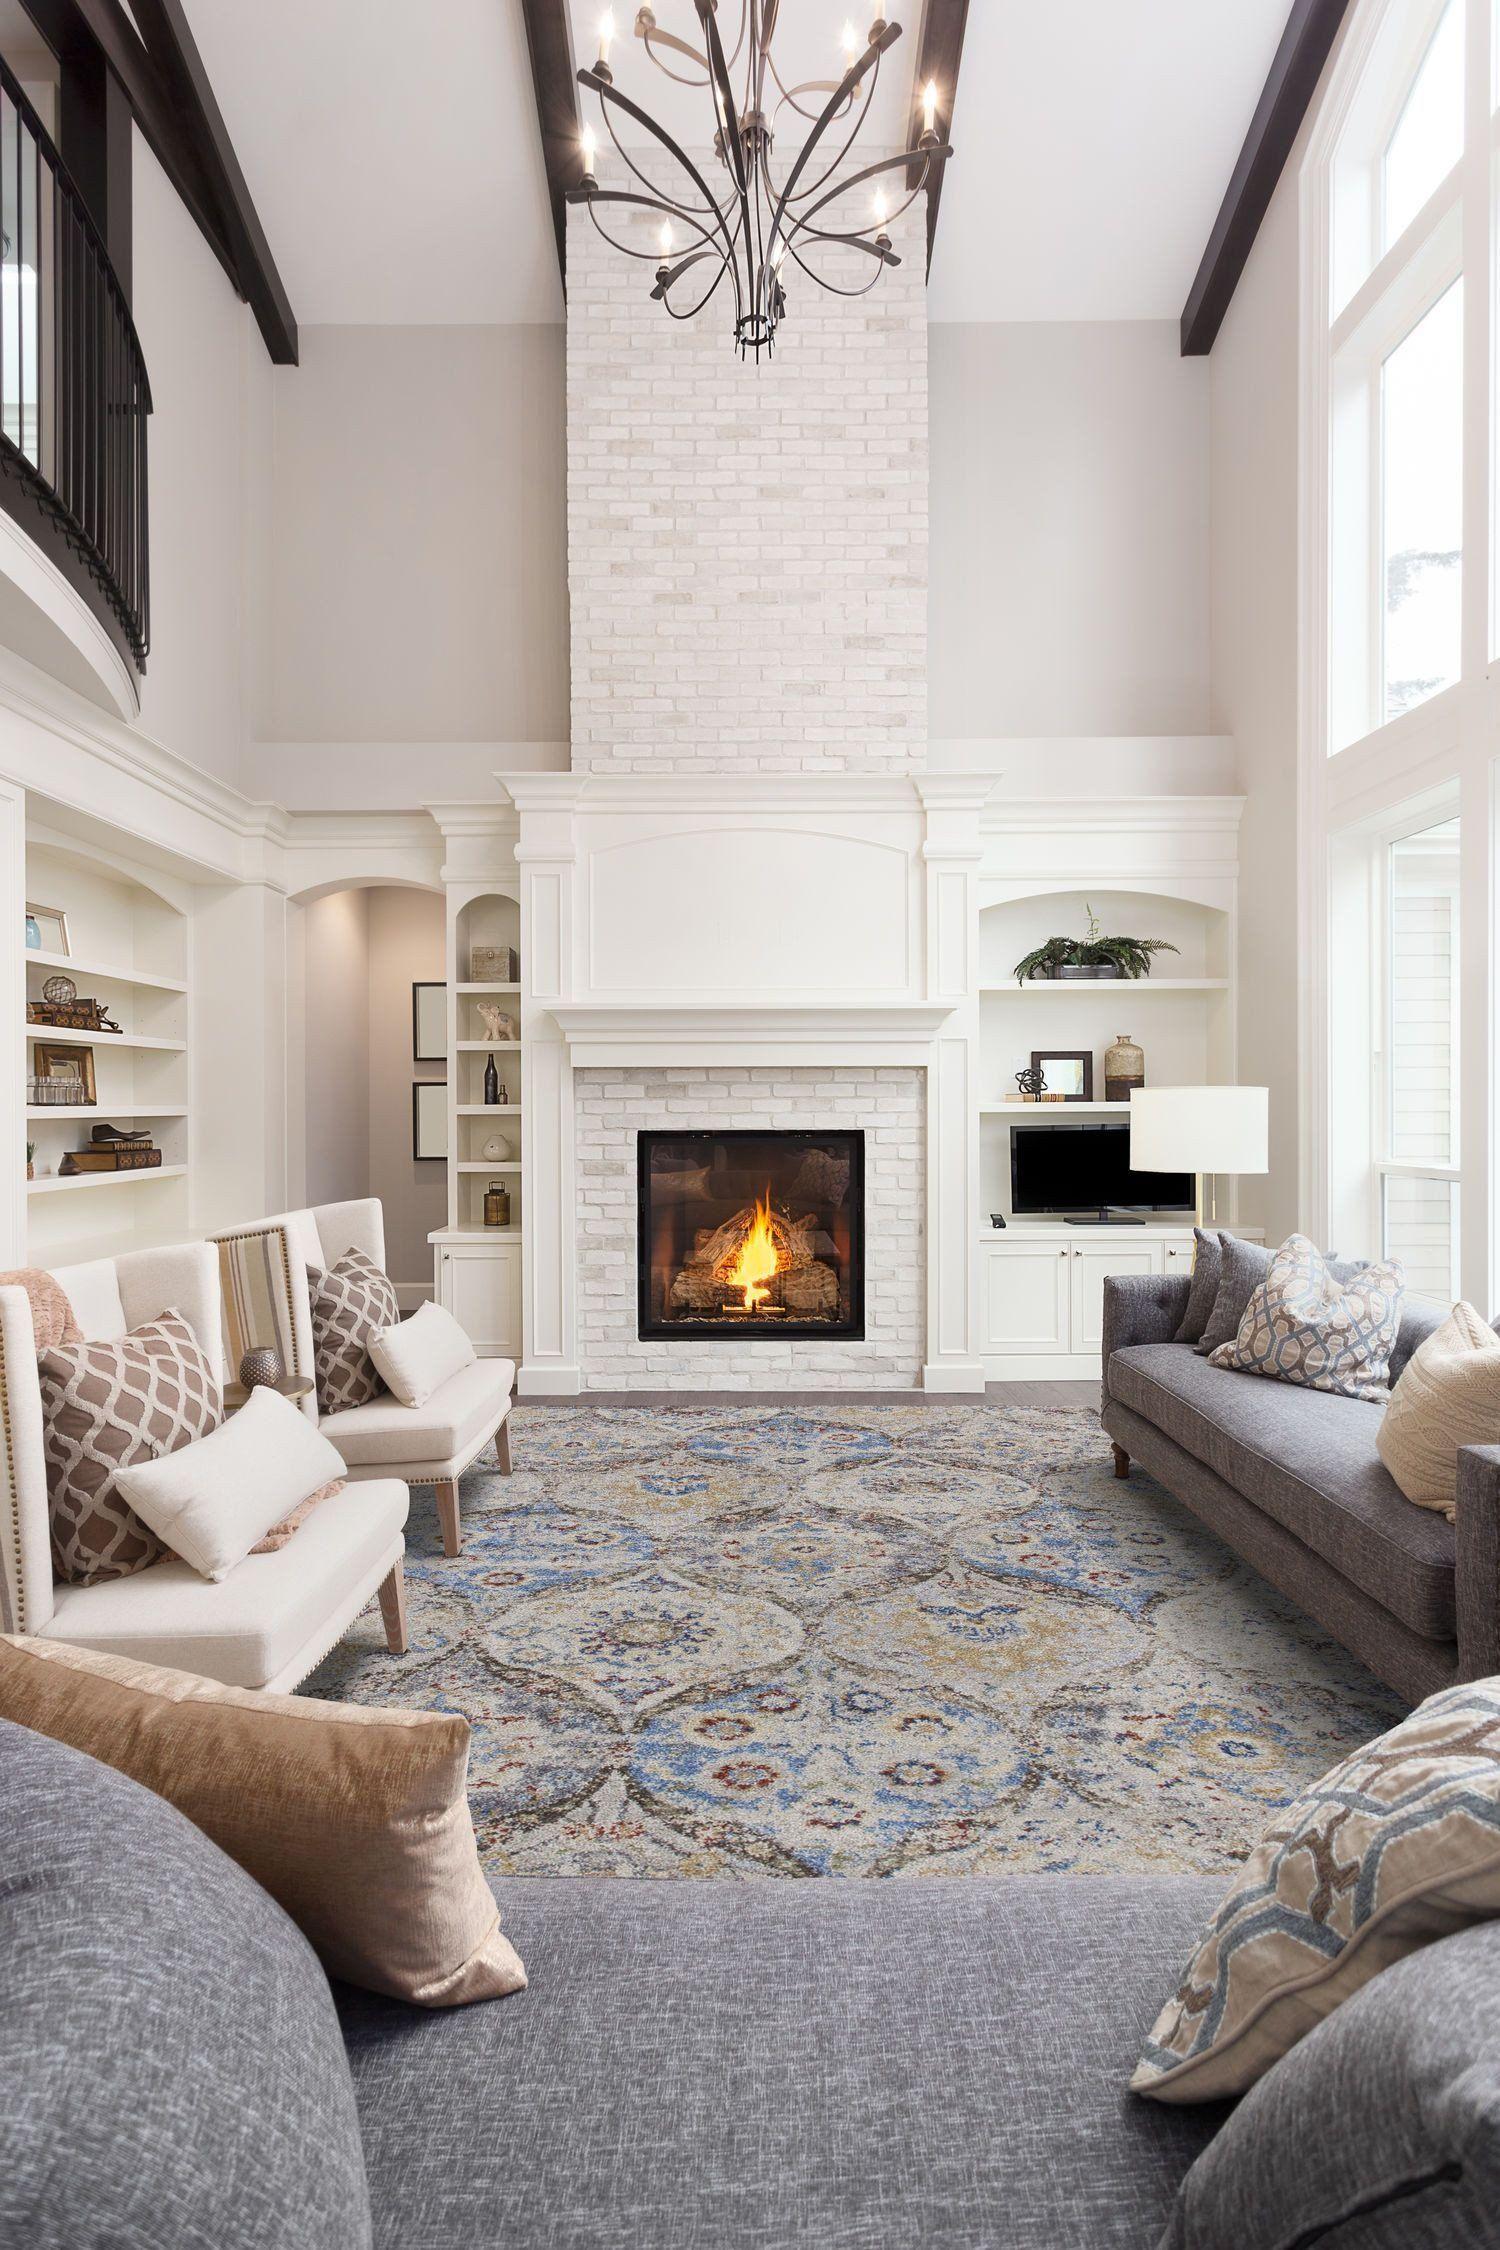 Modern Formal Living Room Furniture Fc11 Rug Color Chocolate Size 7 10 X 10 7 Formal Living Room Designs Rectangle Living Room Formal Living Room Decor